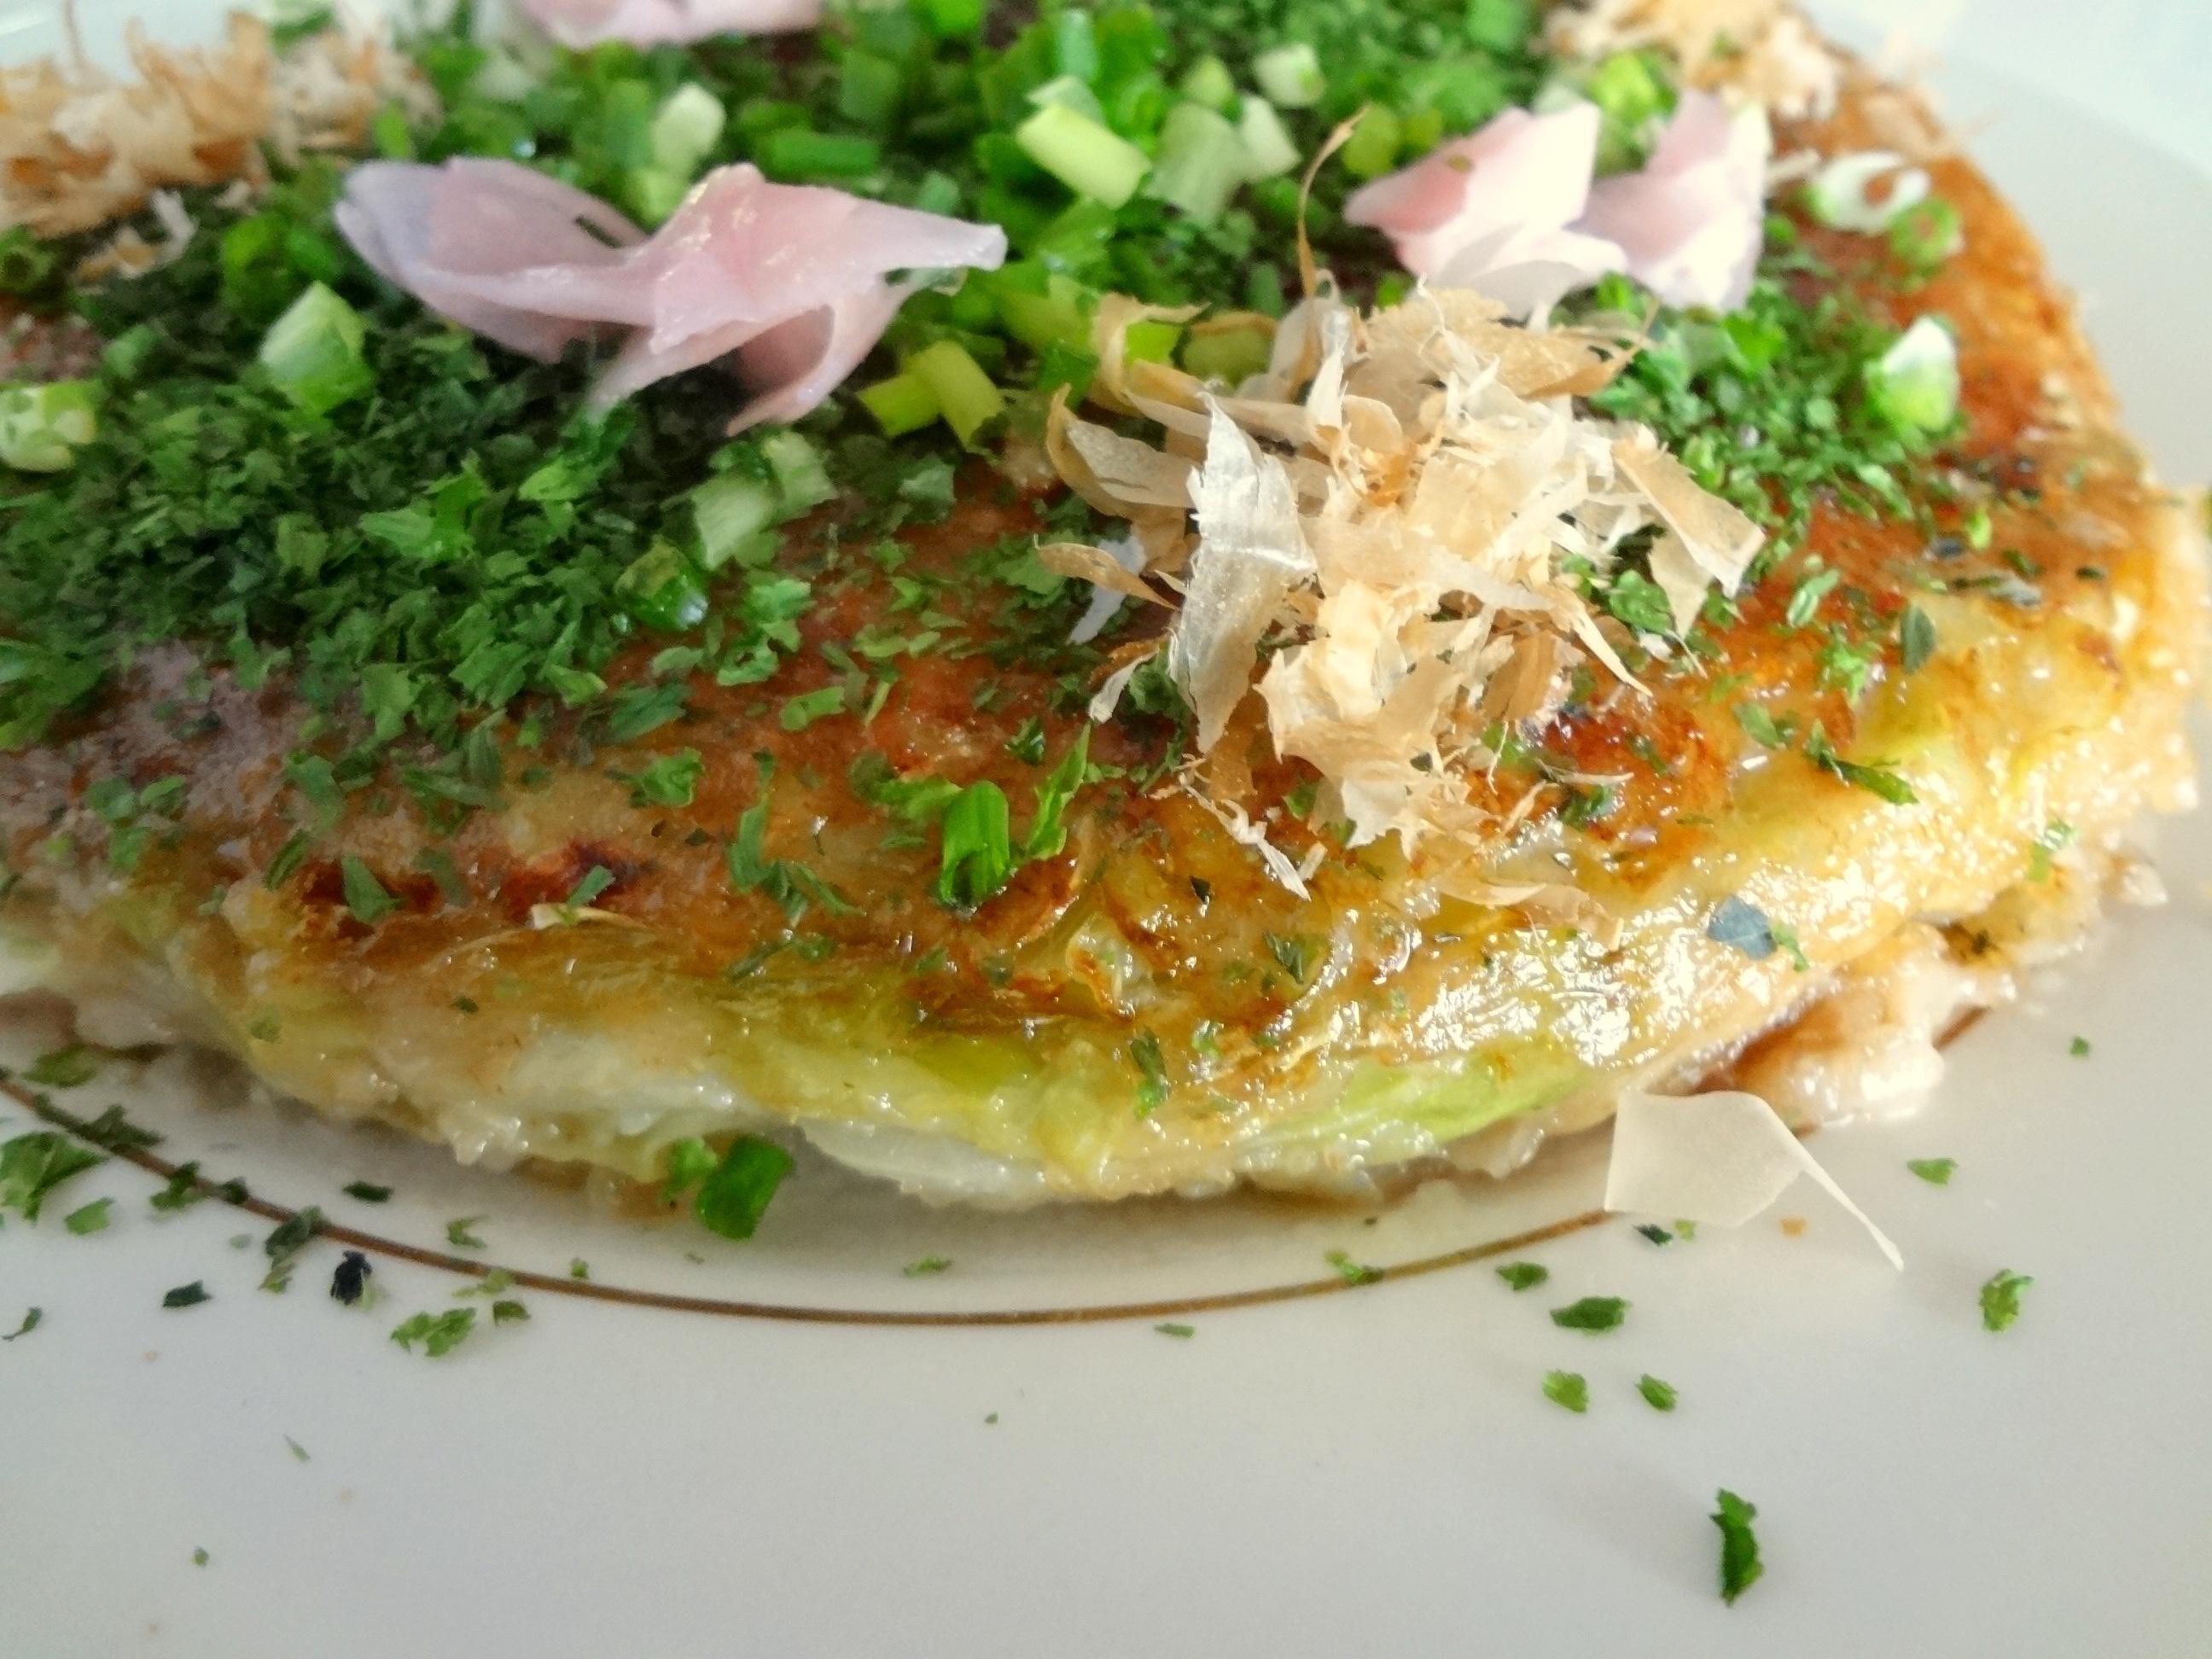 Cuisine japonaise gourmande in osaka for Cuisine japonaise